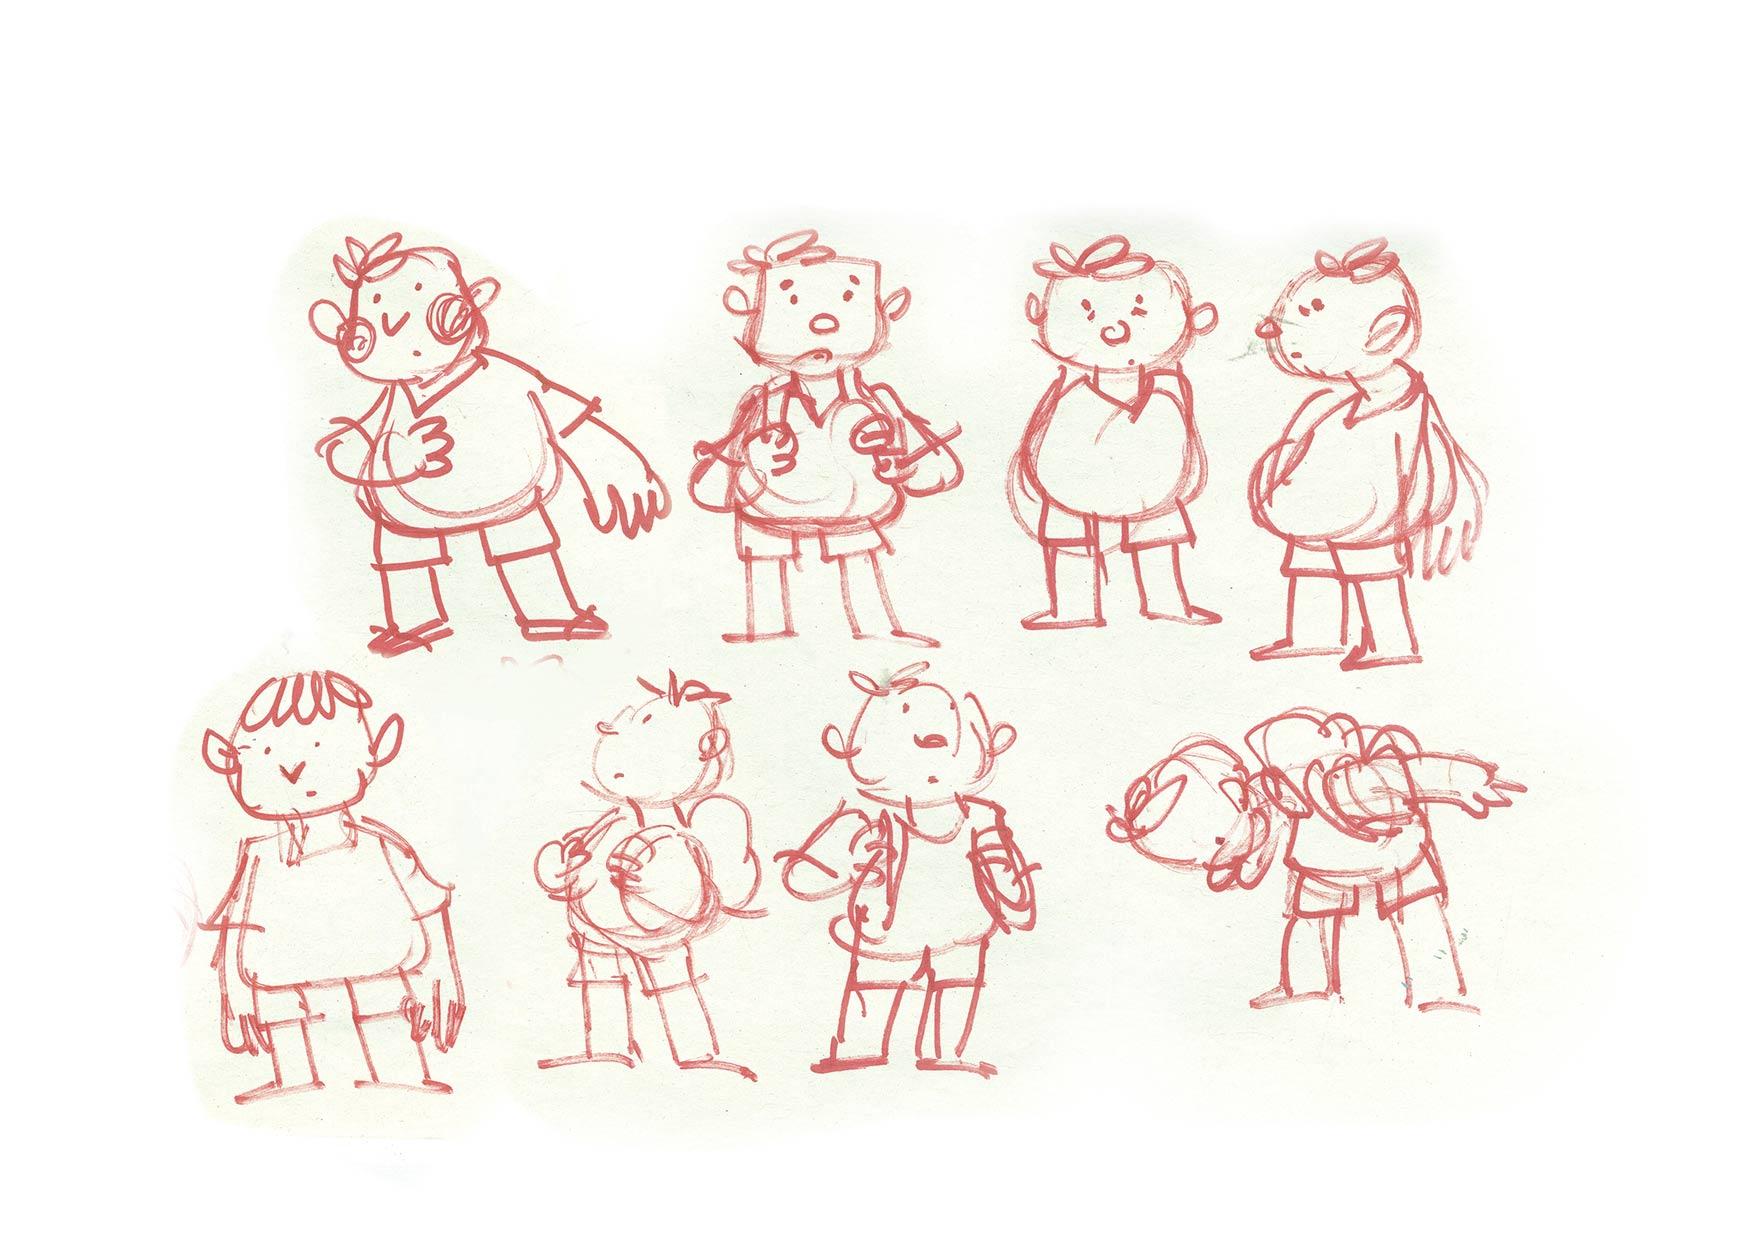 character design study